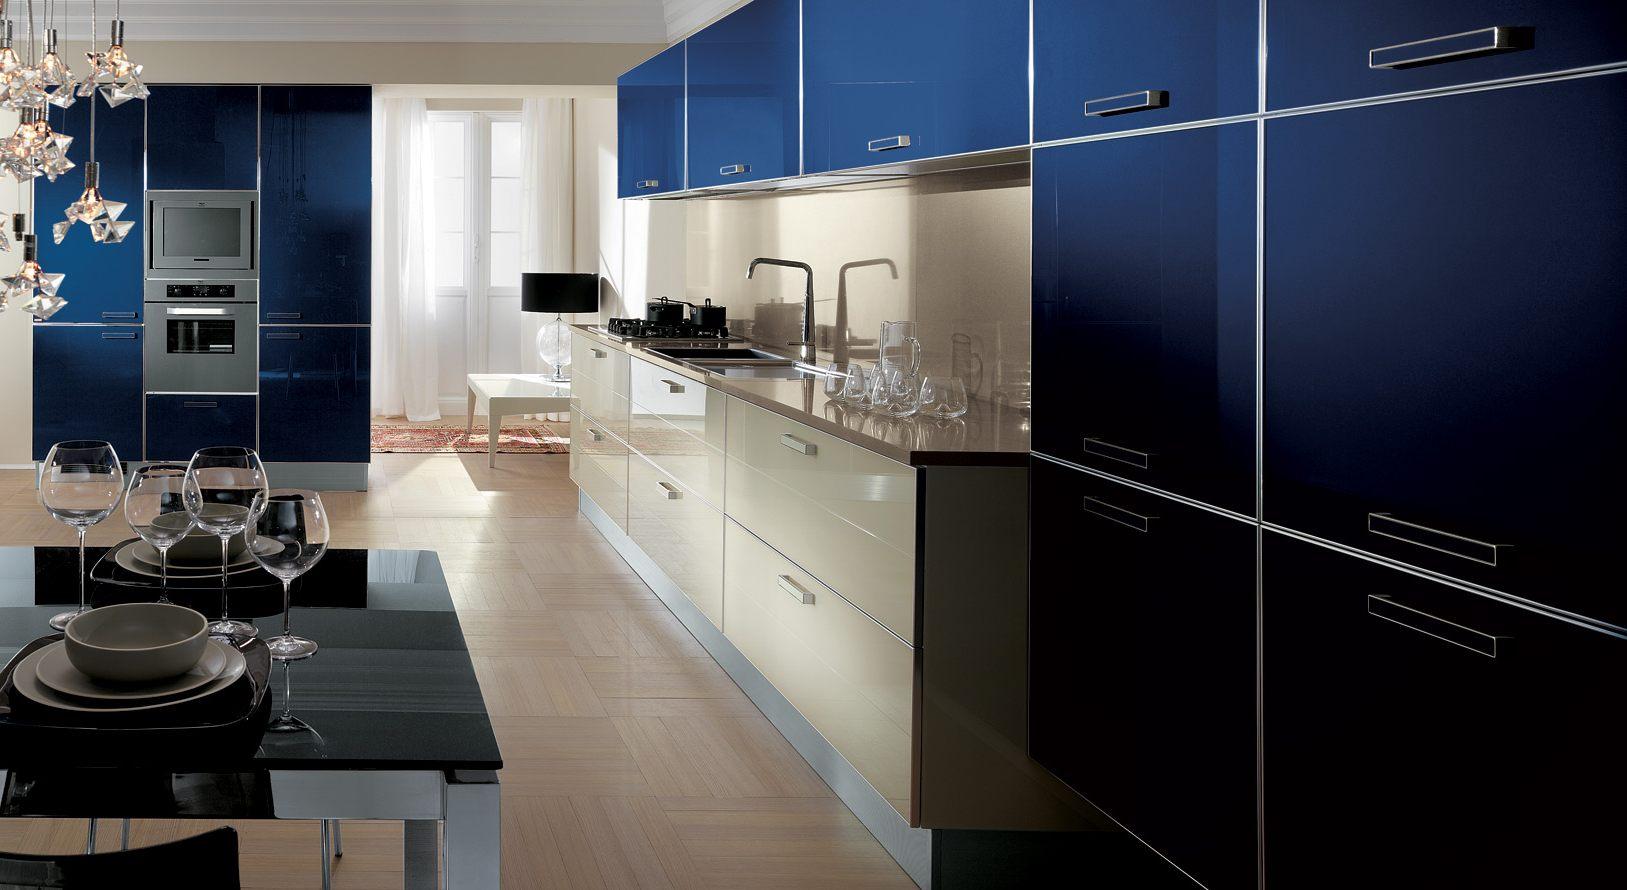 Бежево-синяя глянцевая кухня